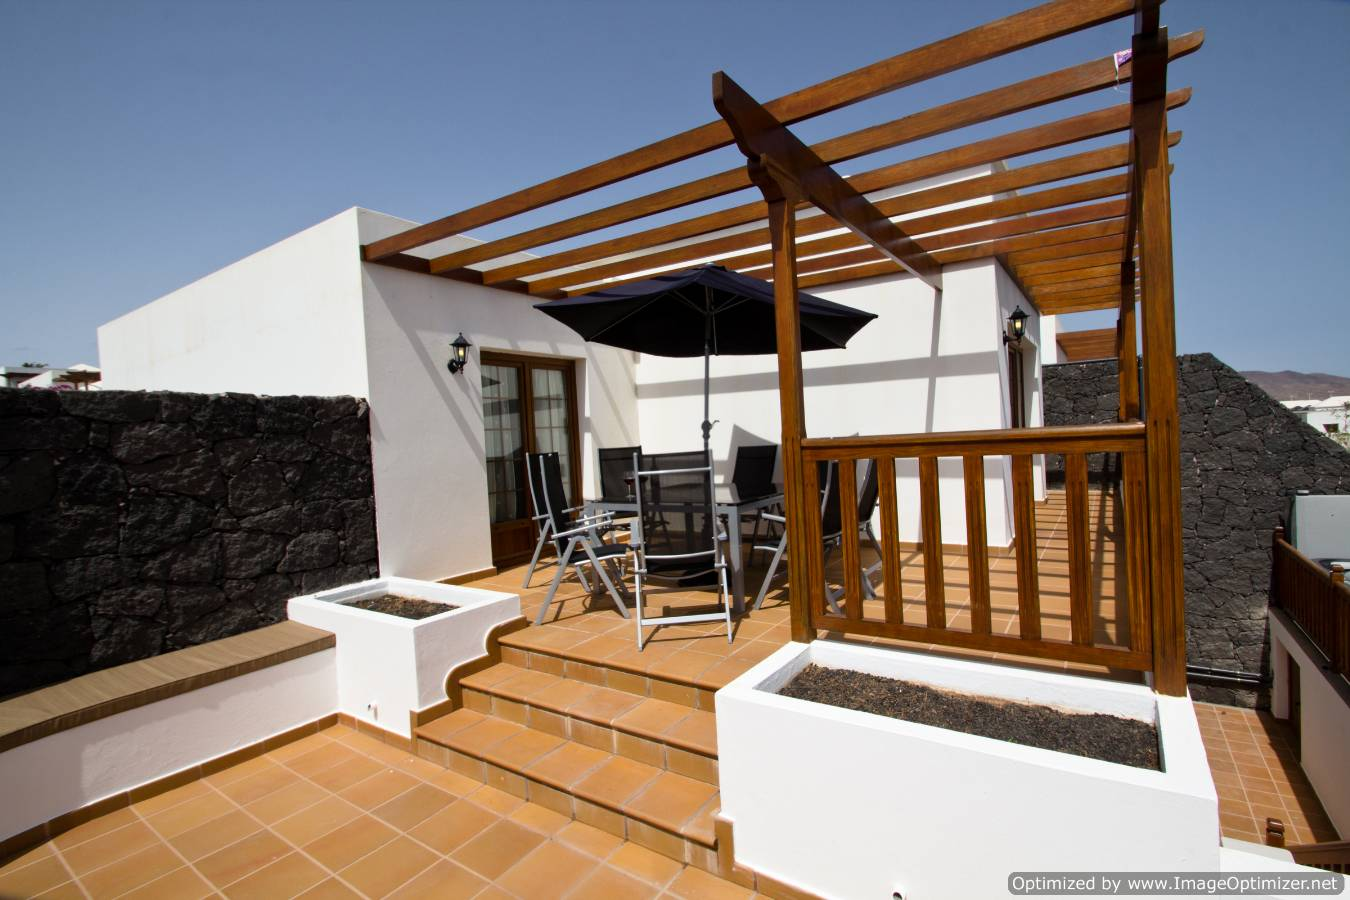 LVC258859 Terrace